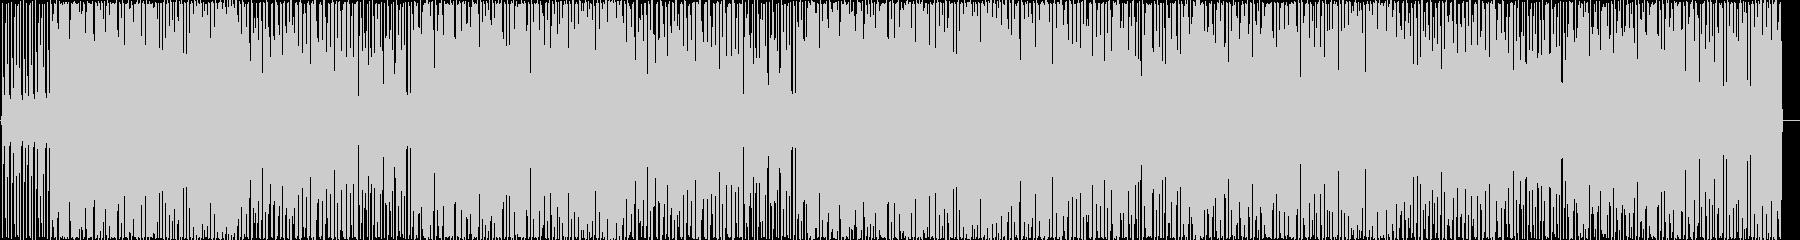 Bright and pop HIPHOP SOUL's unreproduced waveform